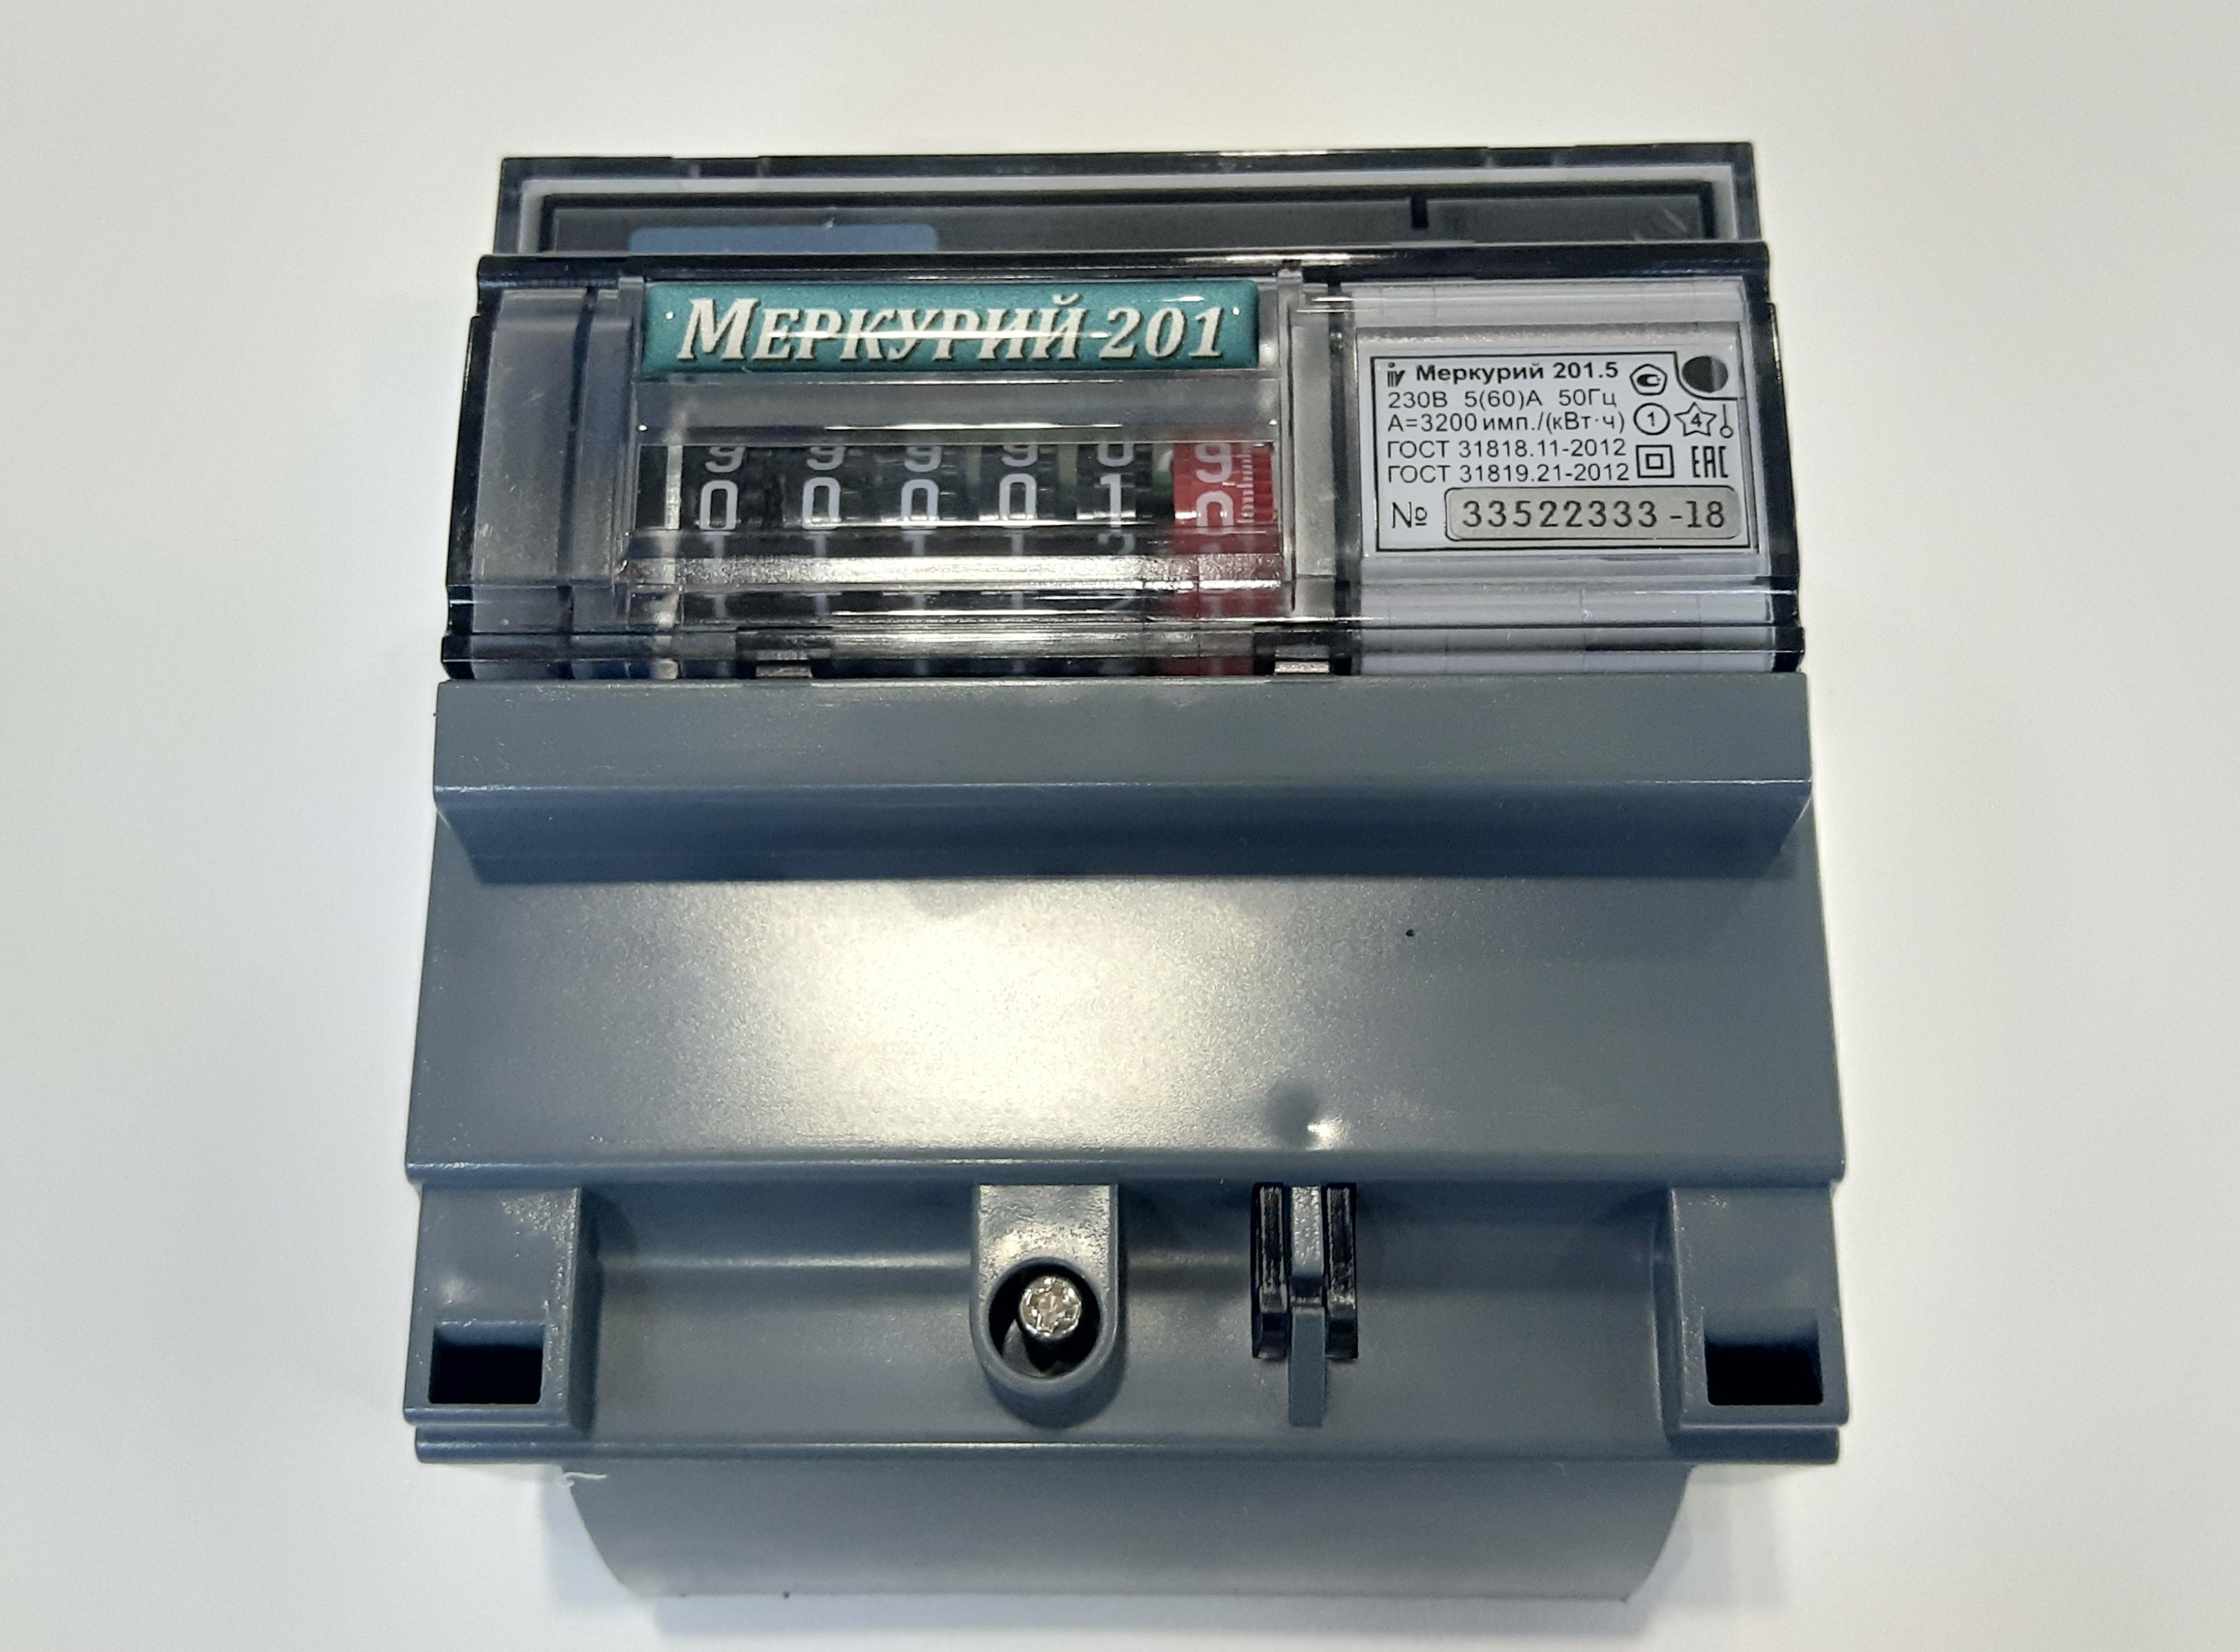 Счетчик меркурий 201.описание счетчика меркурий 201.электрощиты.сборка и проектирование.